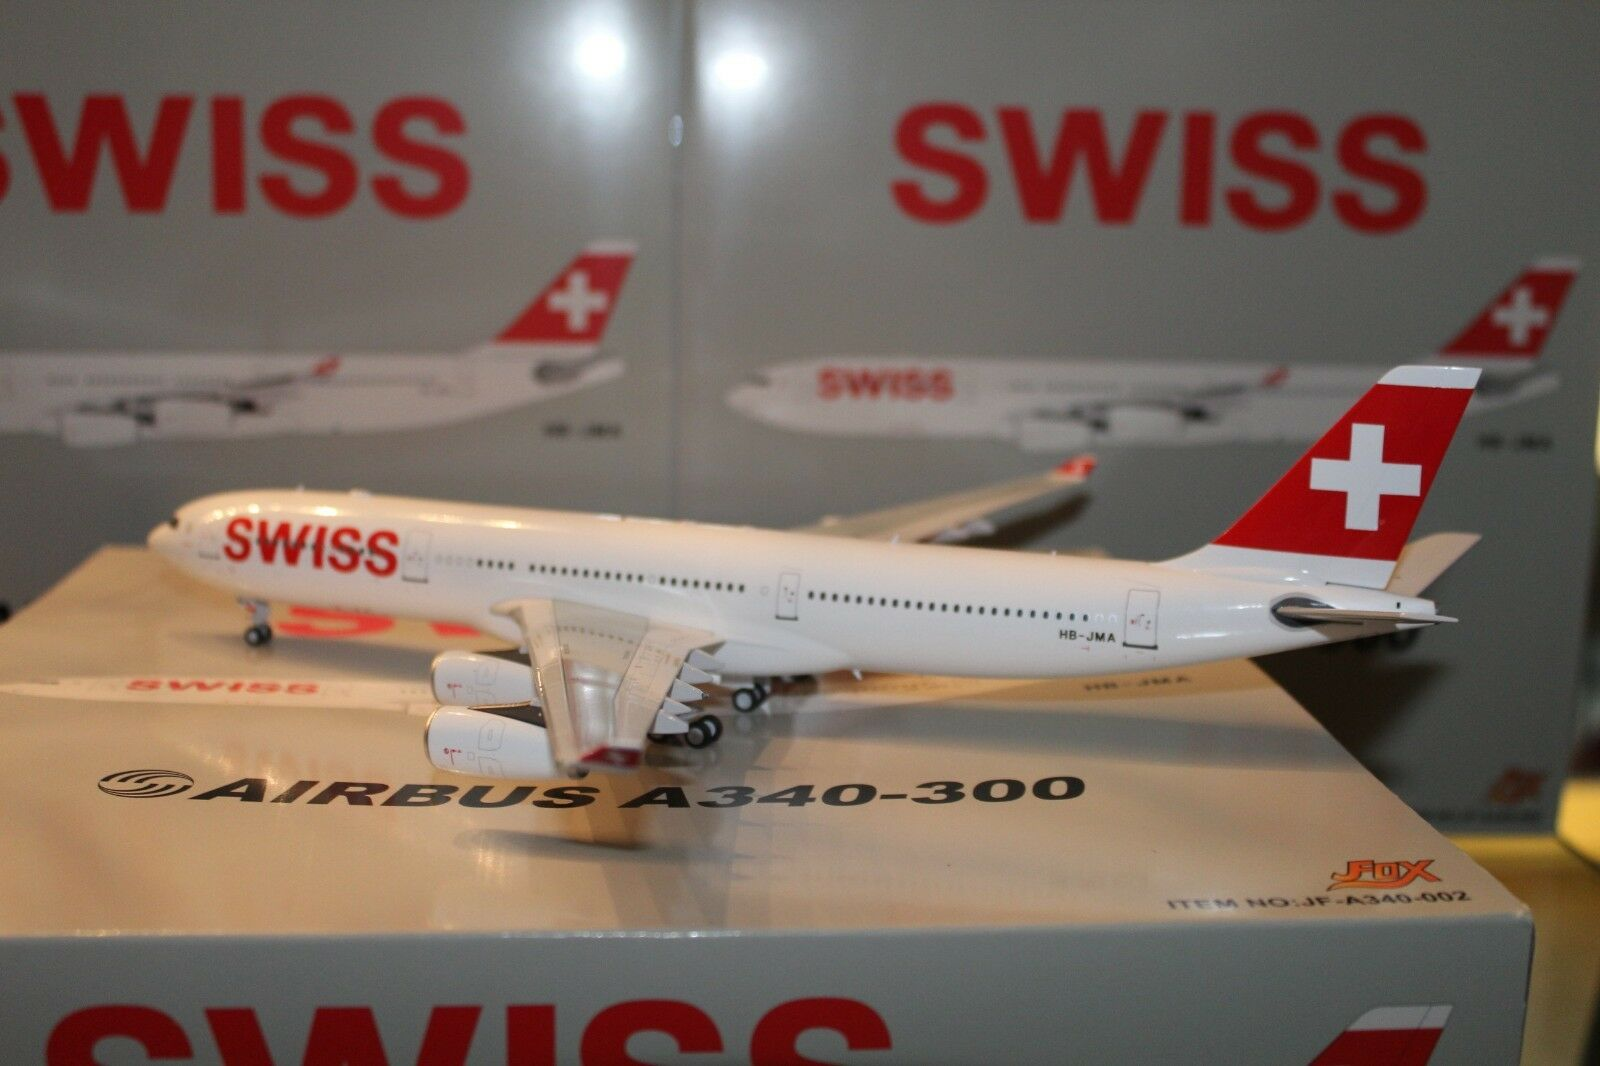 Swiss A430-300 (HB-JMA) 1 200, JFox MODELS